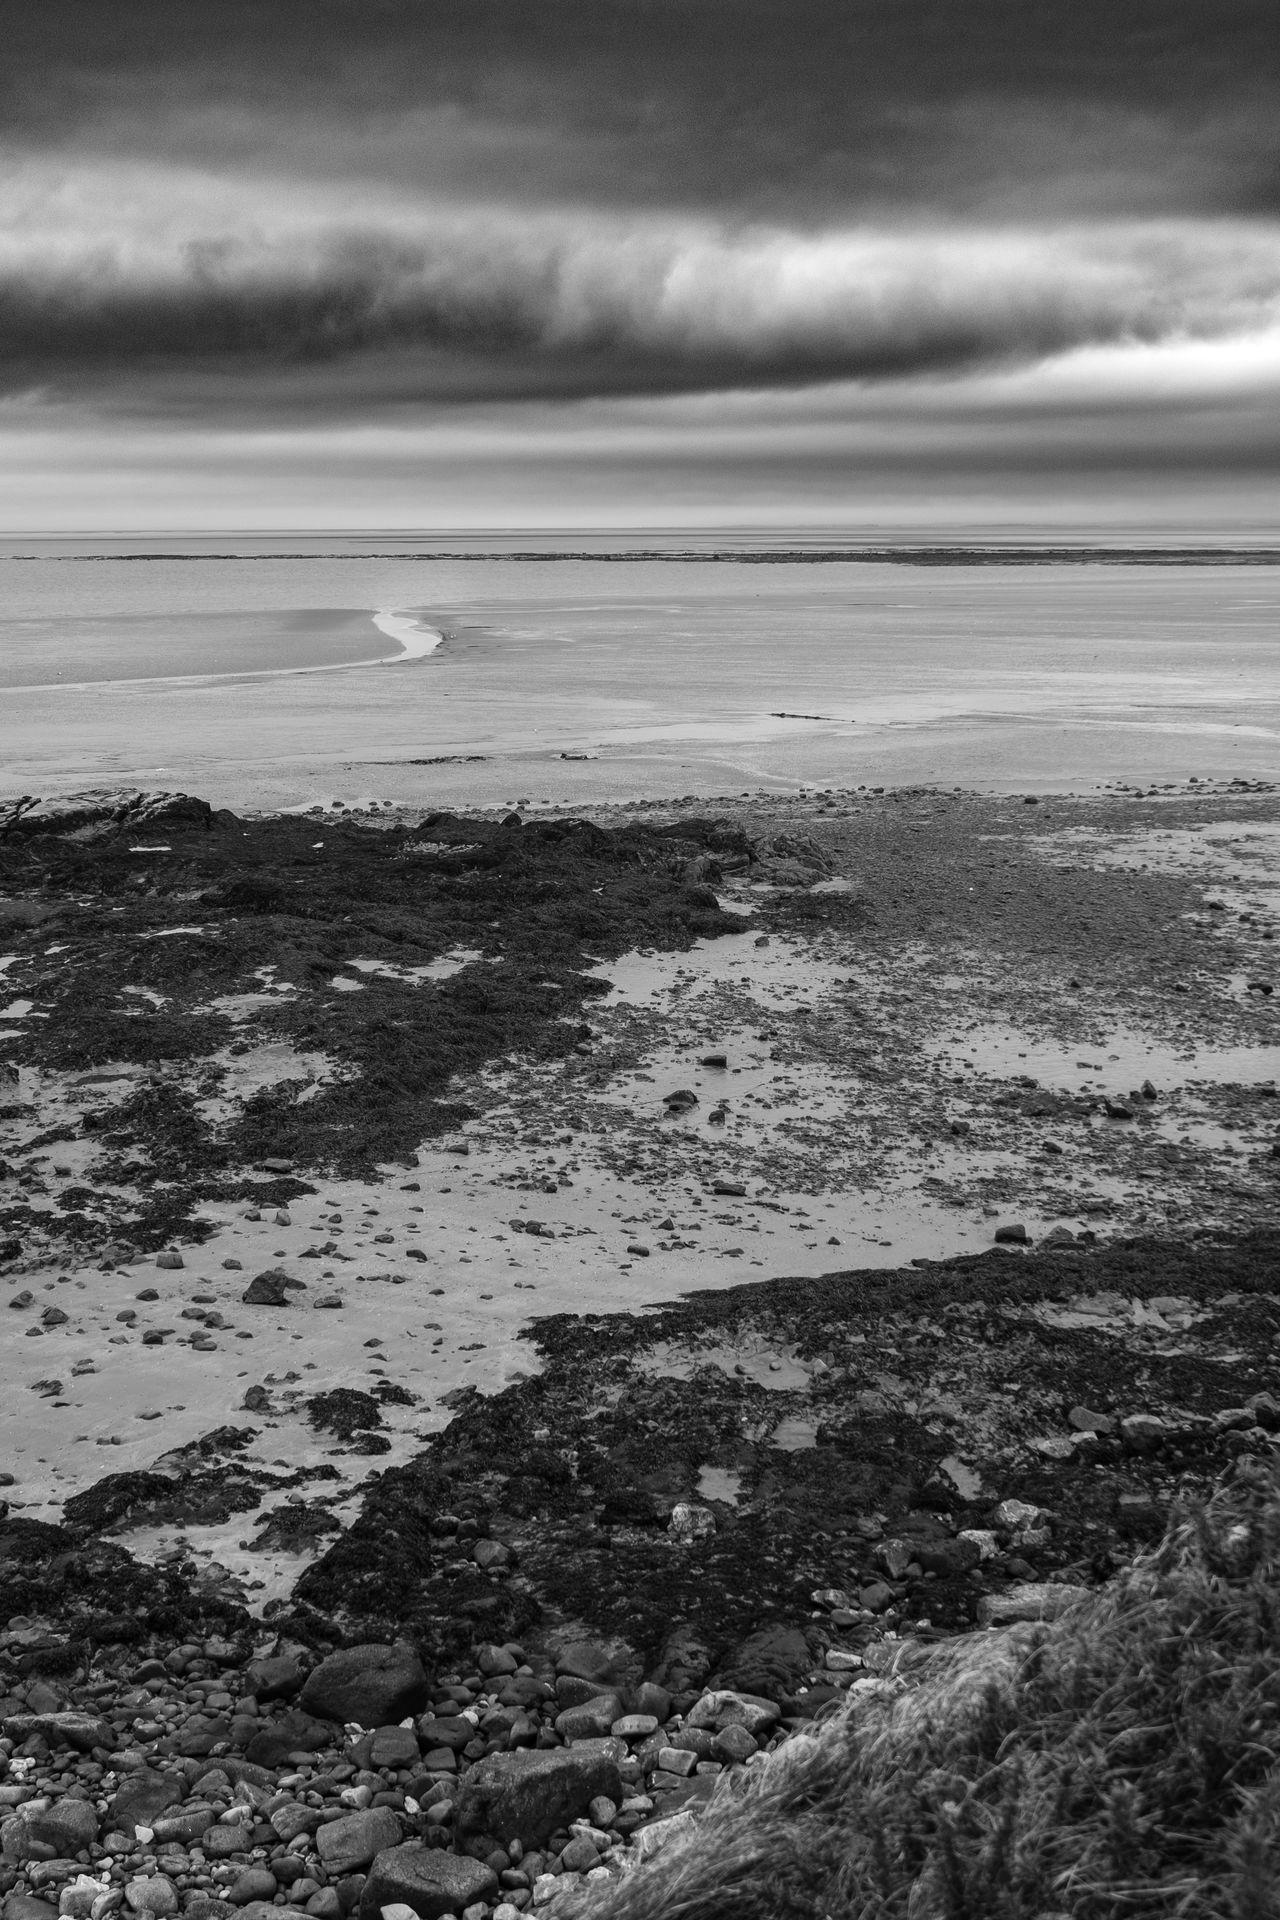 idmphotographer.com Beach Beauty In Nature Cloud - Sky Coastline Cumbria Day Dramatic Sky Heysham Coast High Angle View Horizon Over Water Horizontal Lines Medium Contrast Nature No People Outdoors Sand Scenics Sea Shore Tranquility Vertical Composition Vertical Lines Water Wide Angle